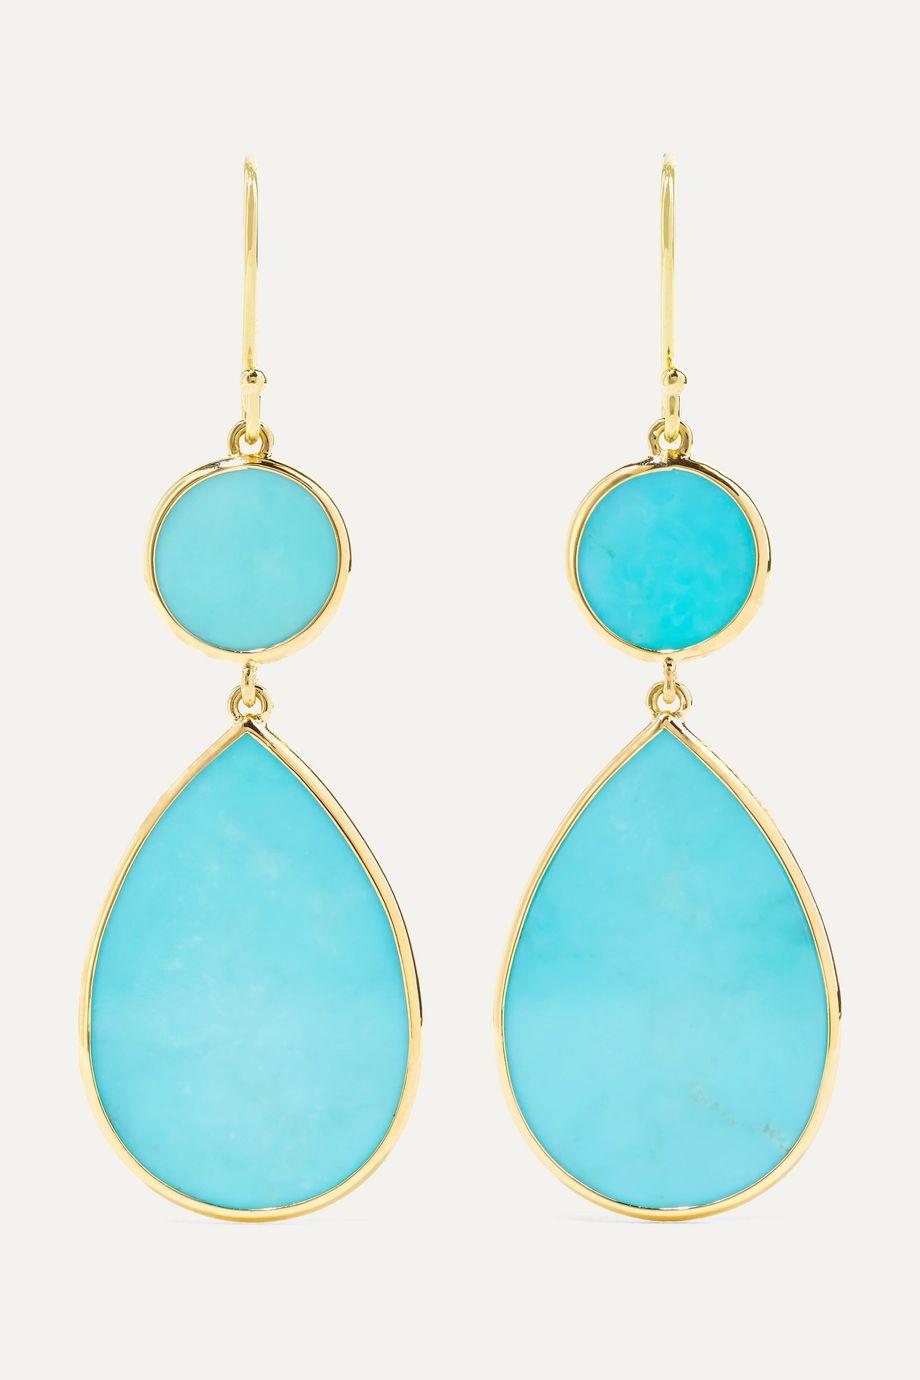 Ippolita Polished Rock Candy 18-karat gold turquoise earrings